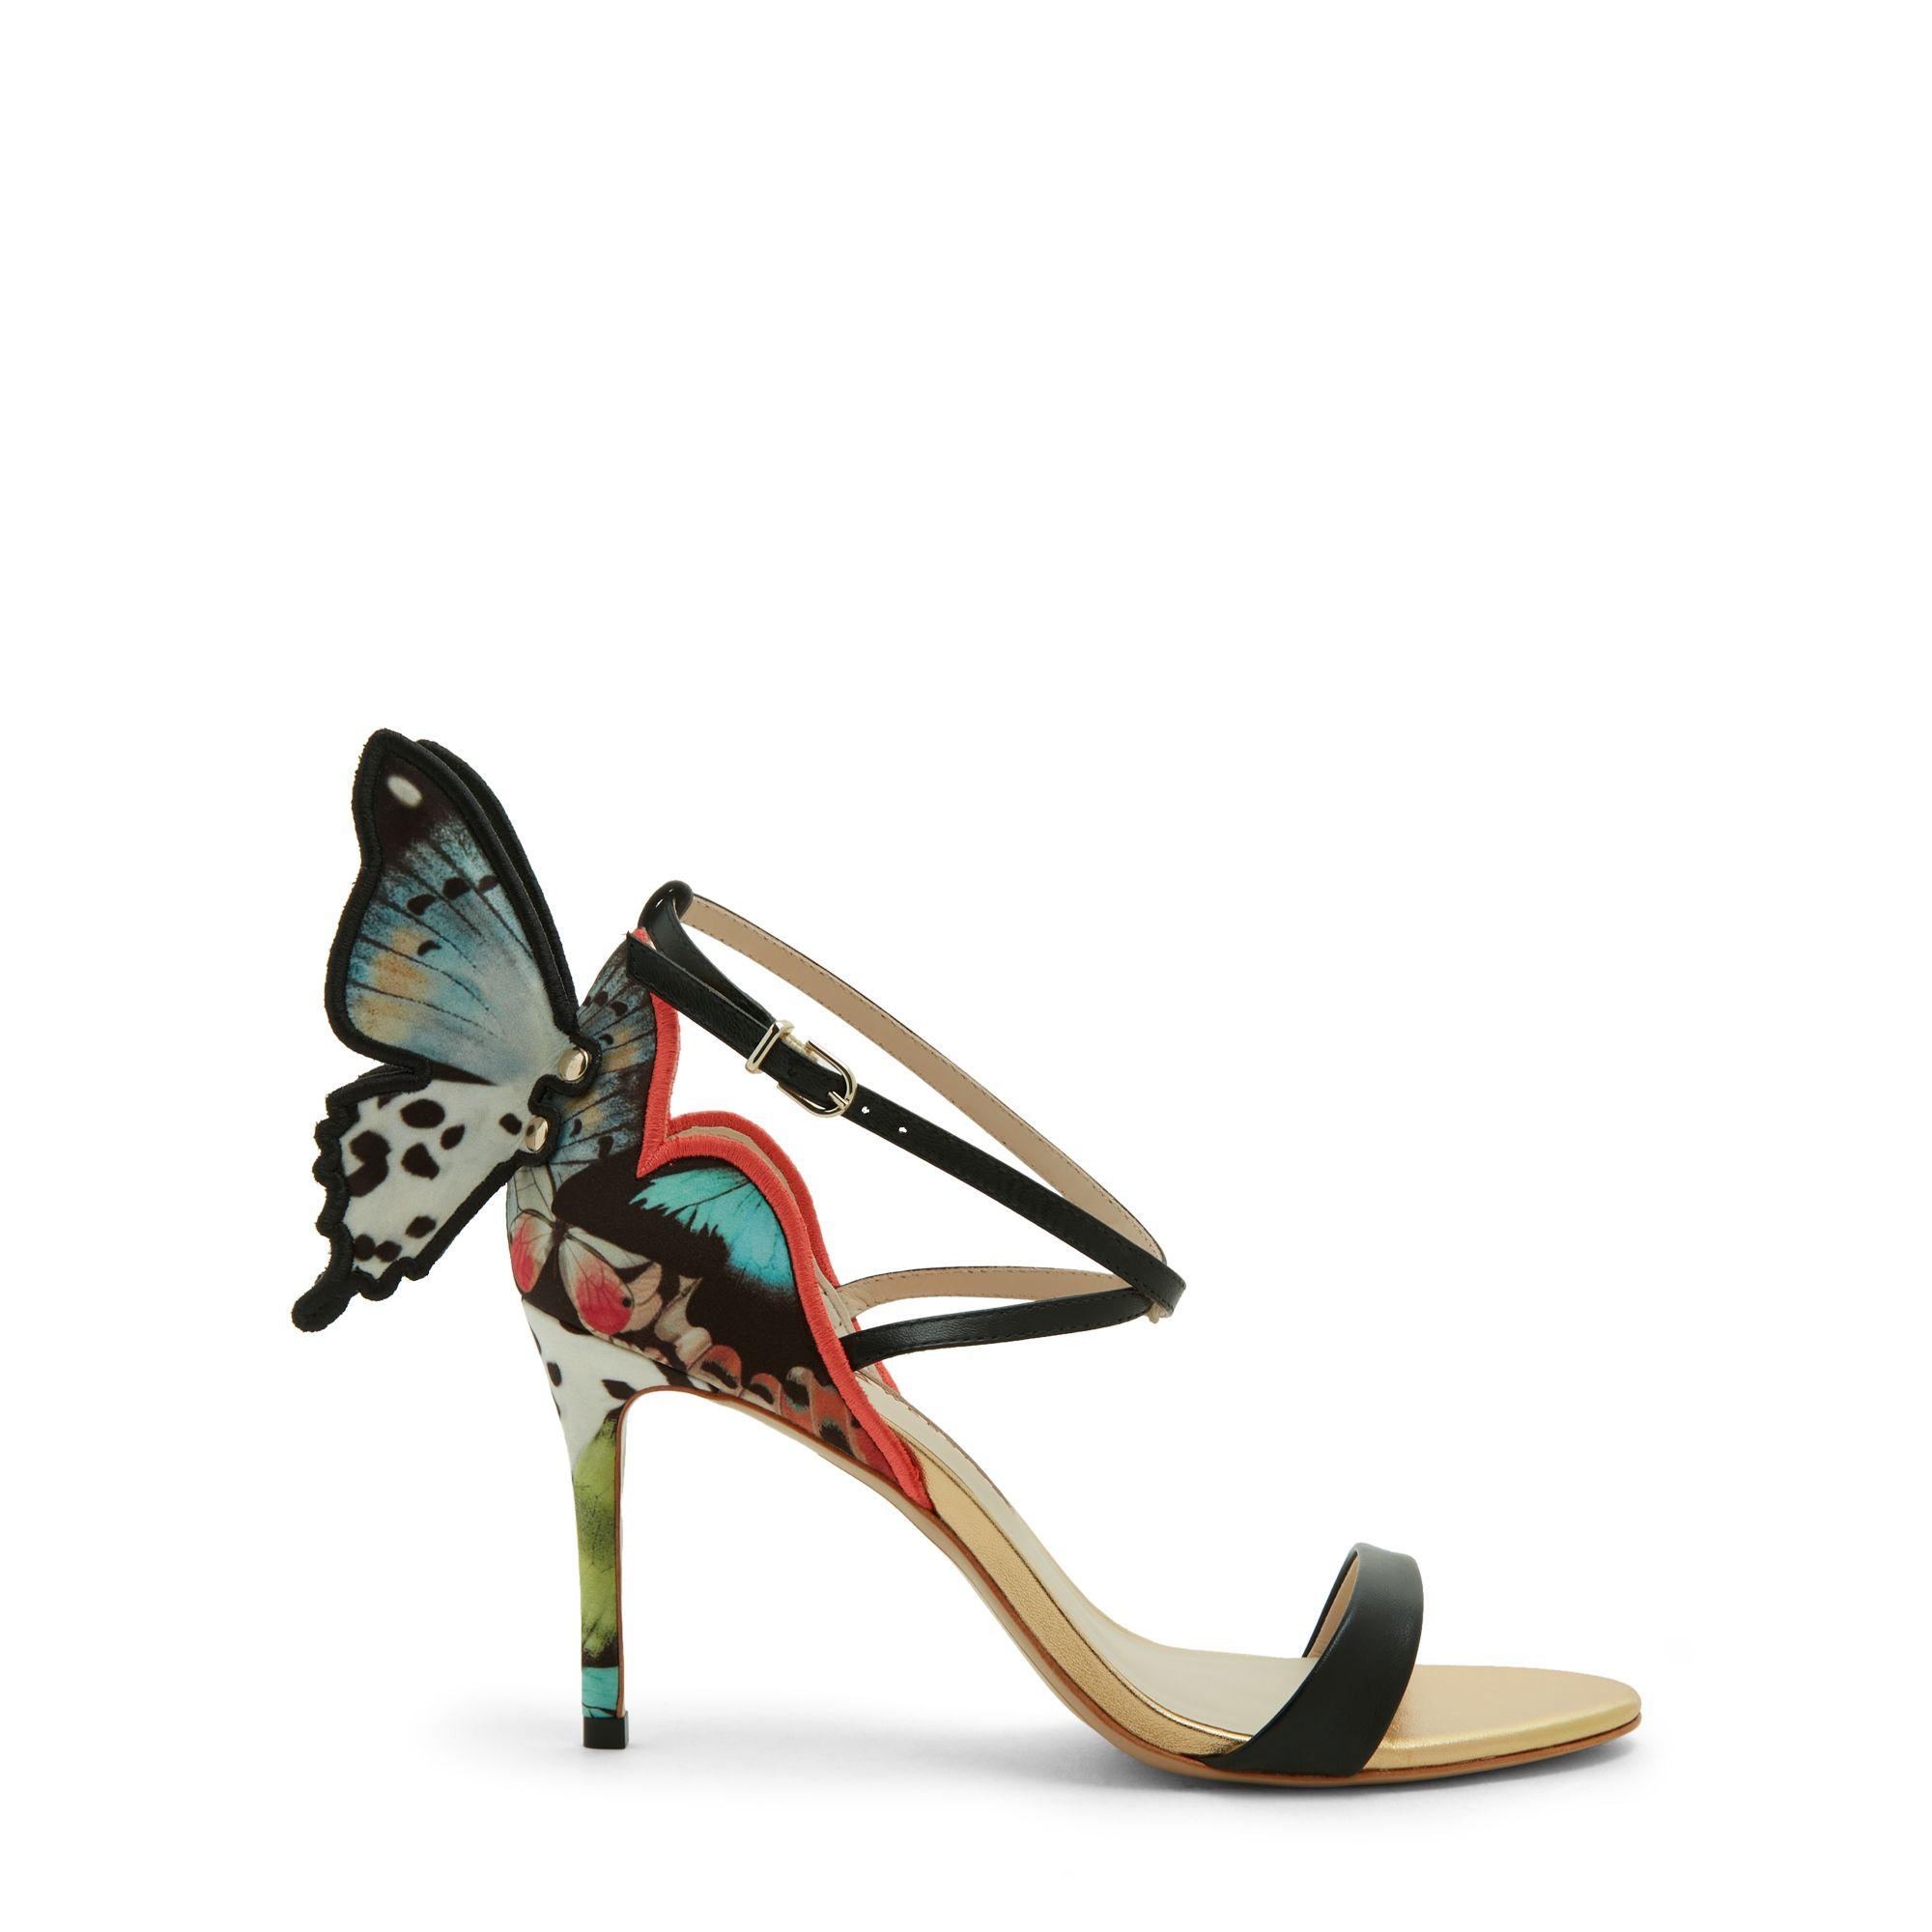 Chiara 85 sandals